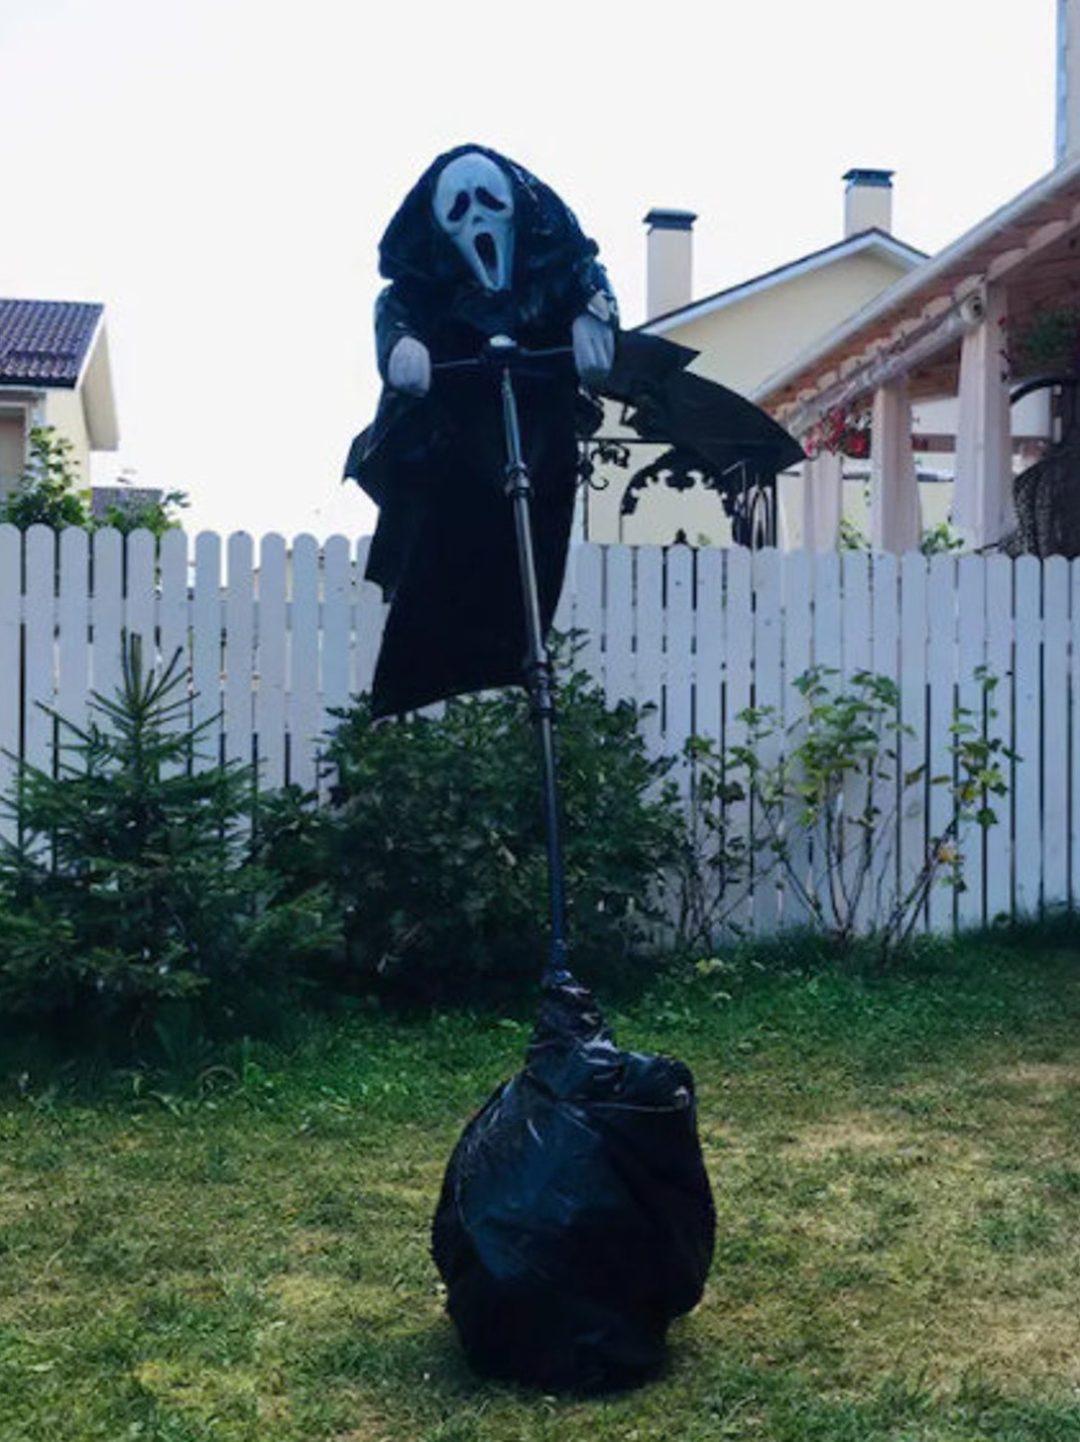 Scream Scarecrow Outdoor Halloween decor